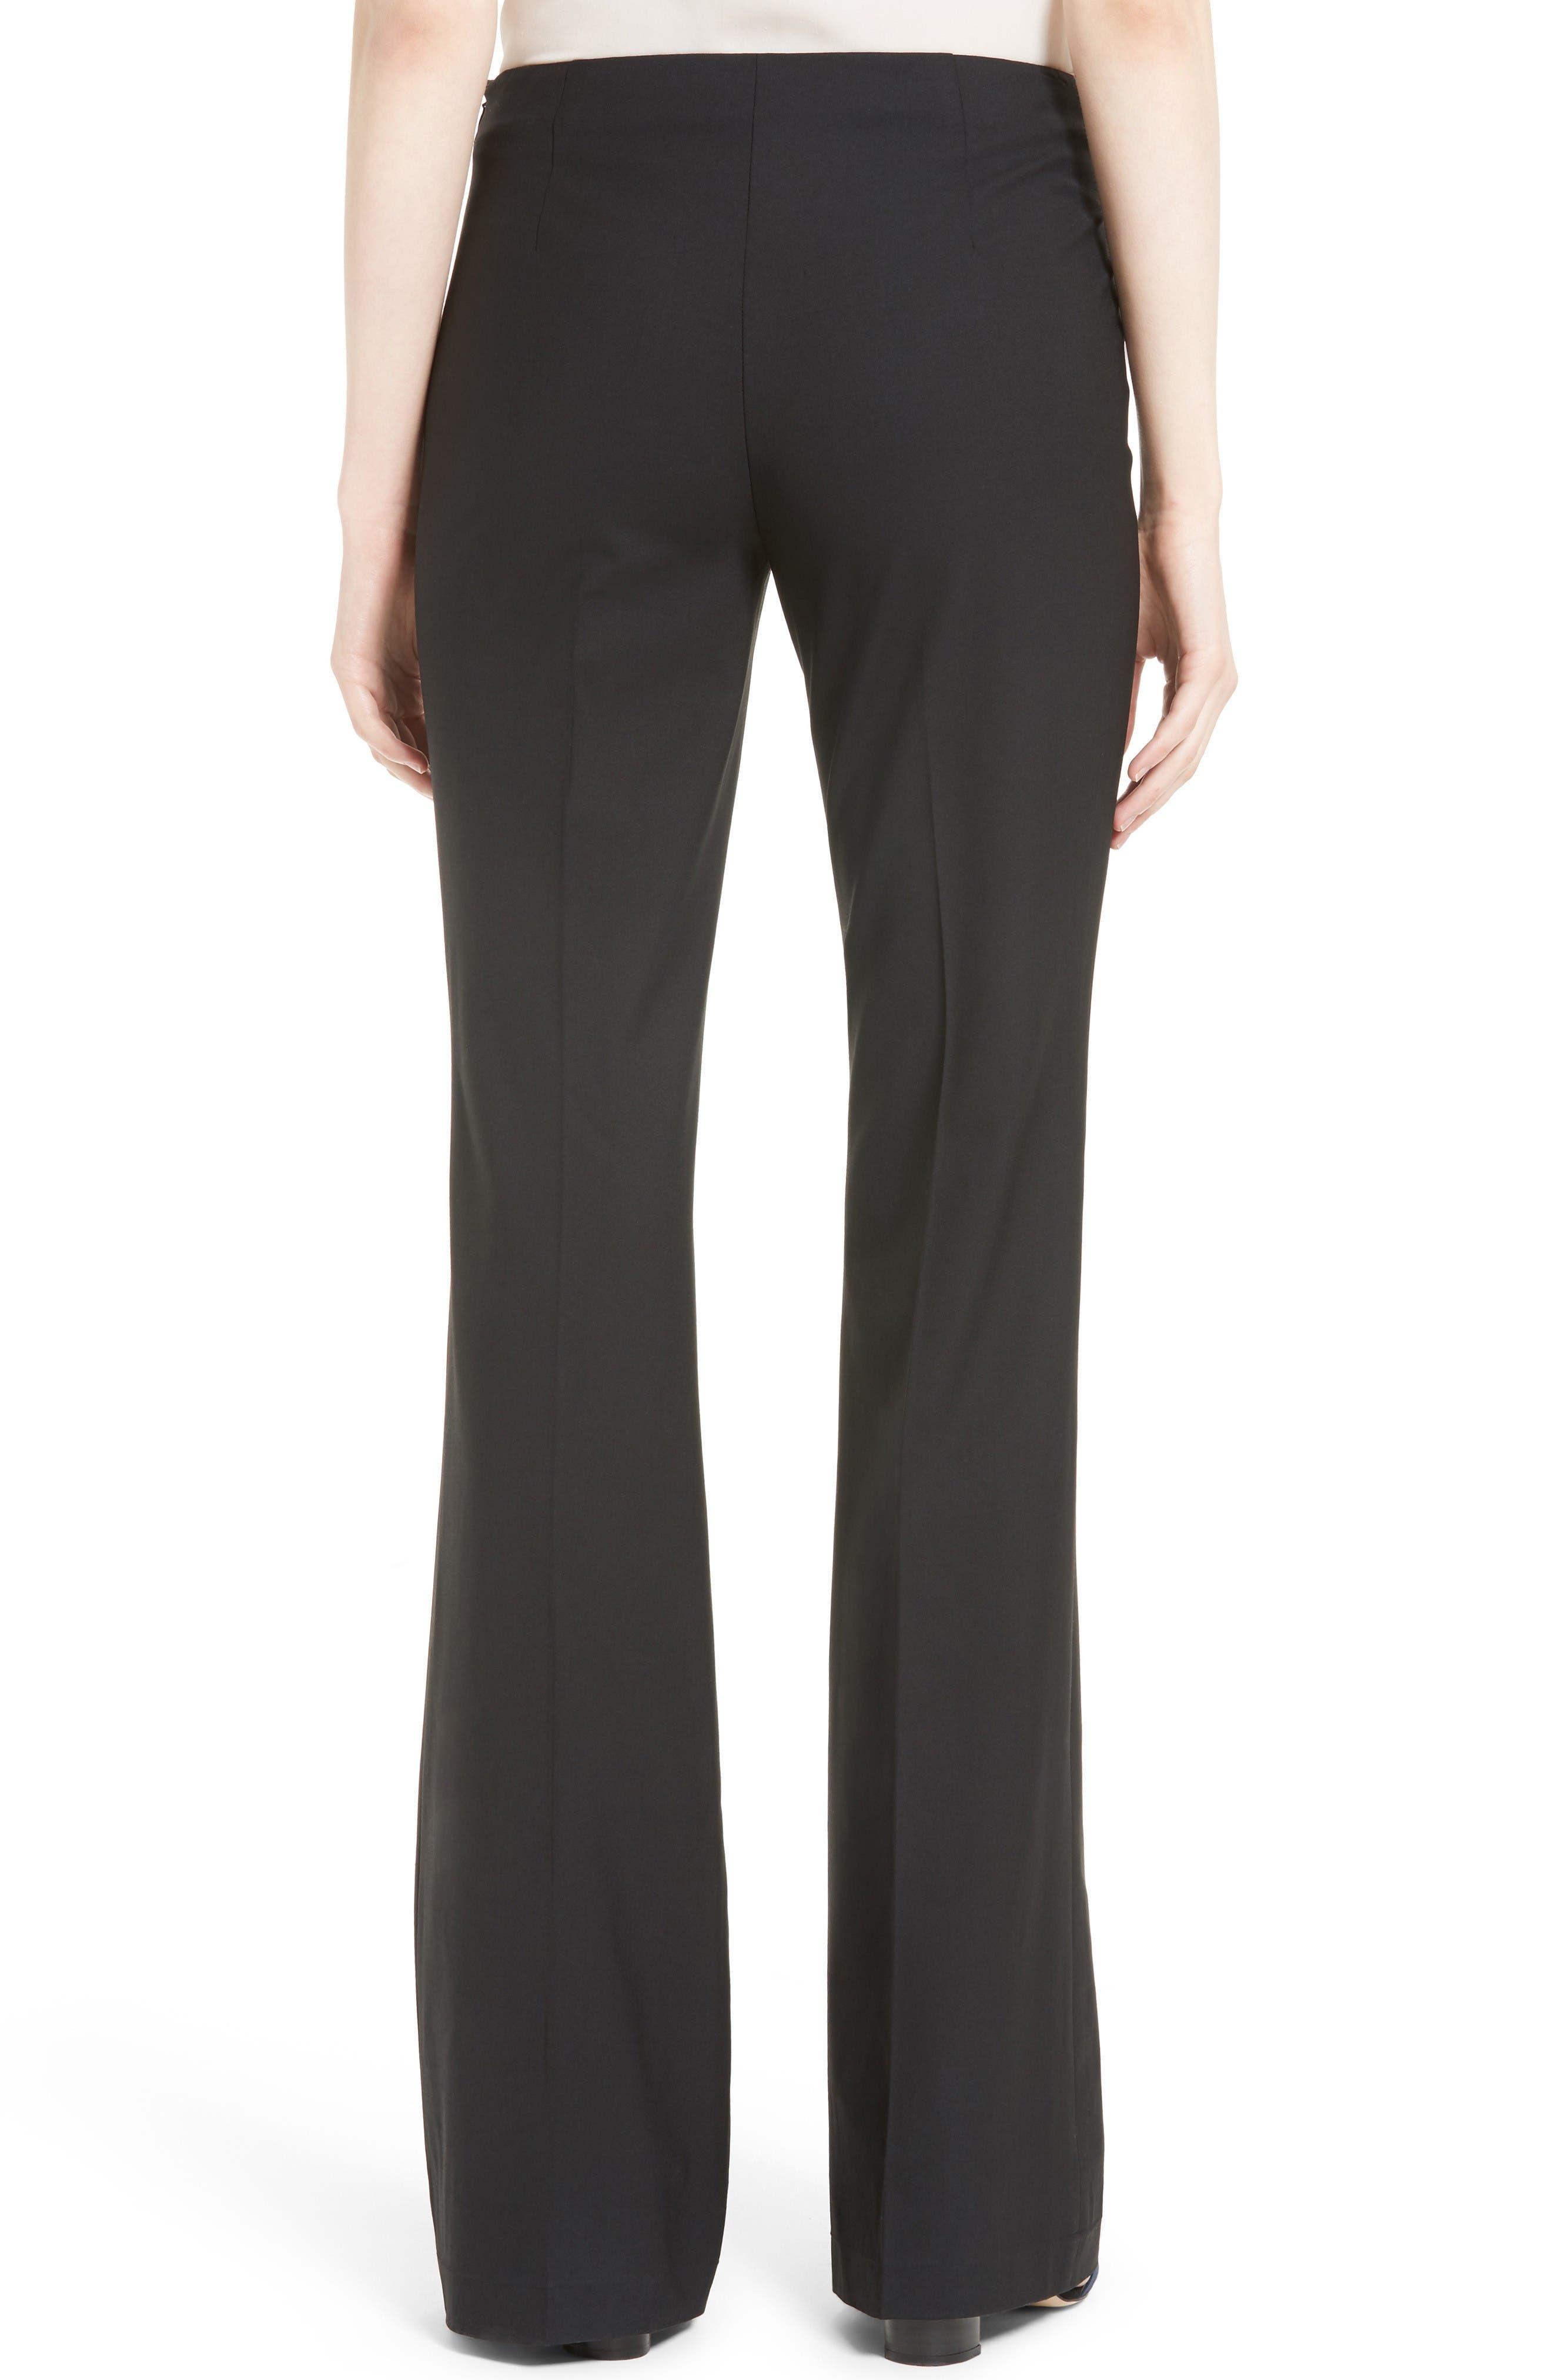 Demitria Flare Leg Good Wool Suit Pants,                             Alternate thumbnail 2, color,                             Black